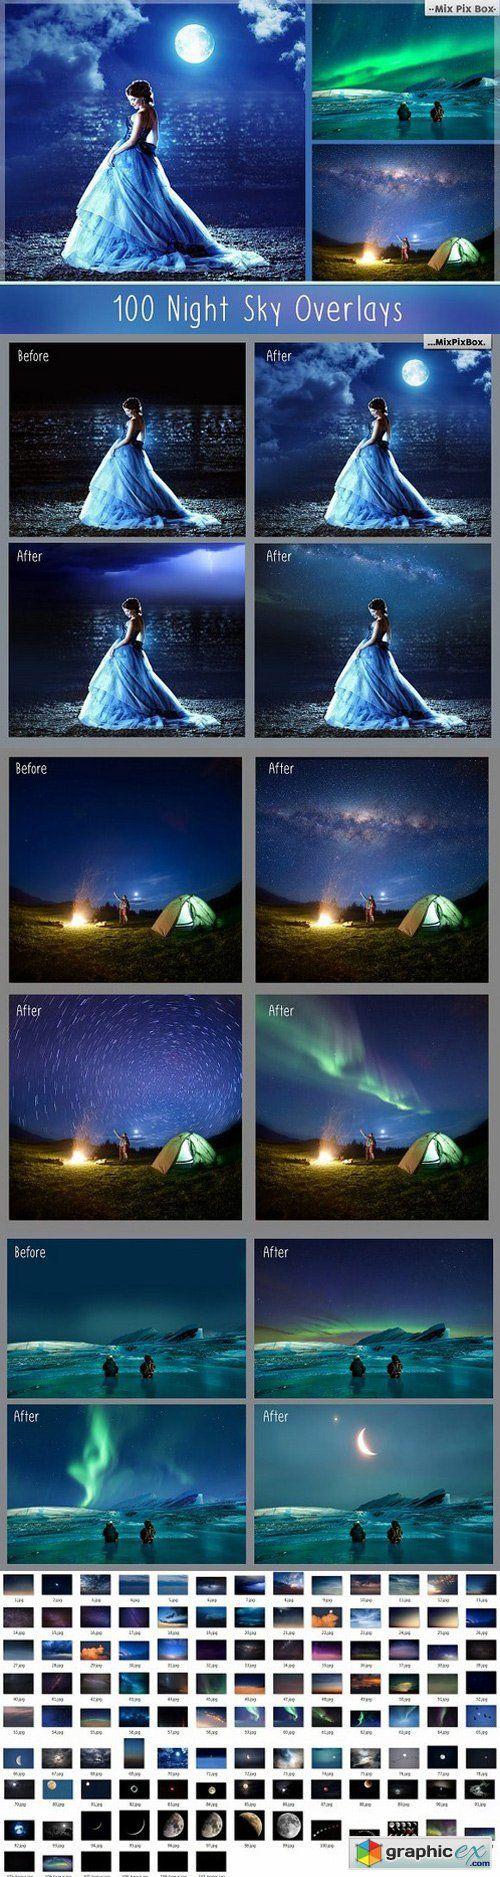 100 Night Sky Overlays  stock images